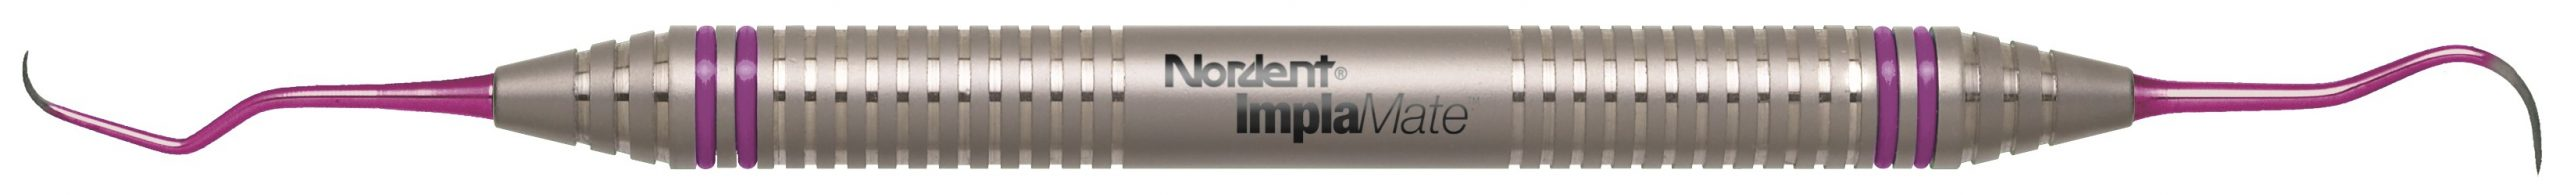 Anterior Scalette N137M (Implant Maintenance)